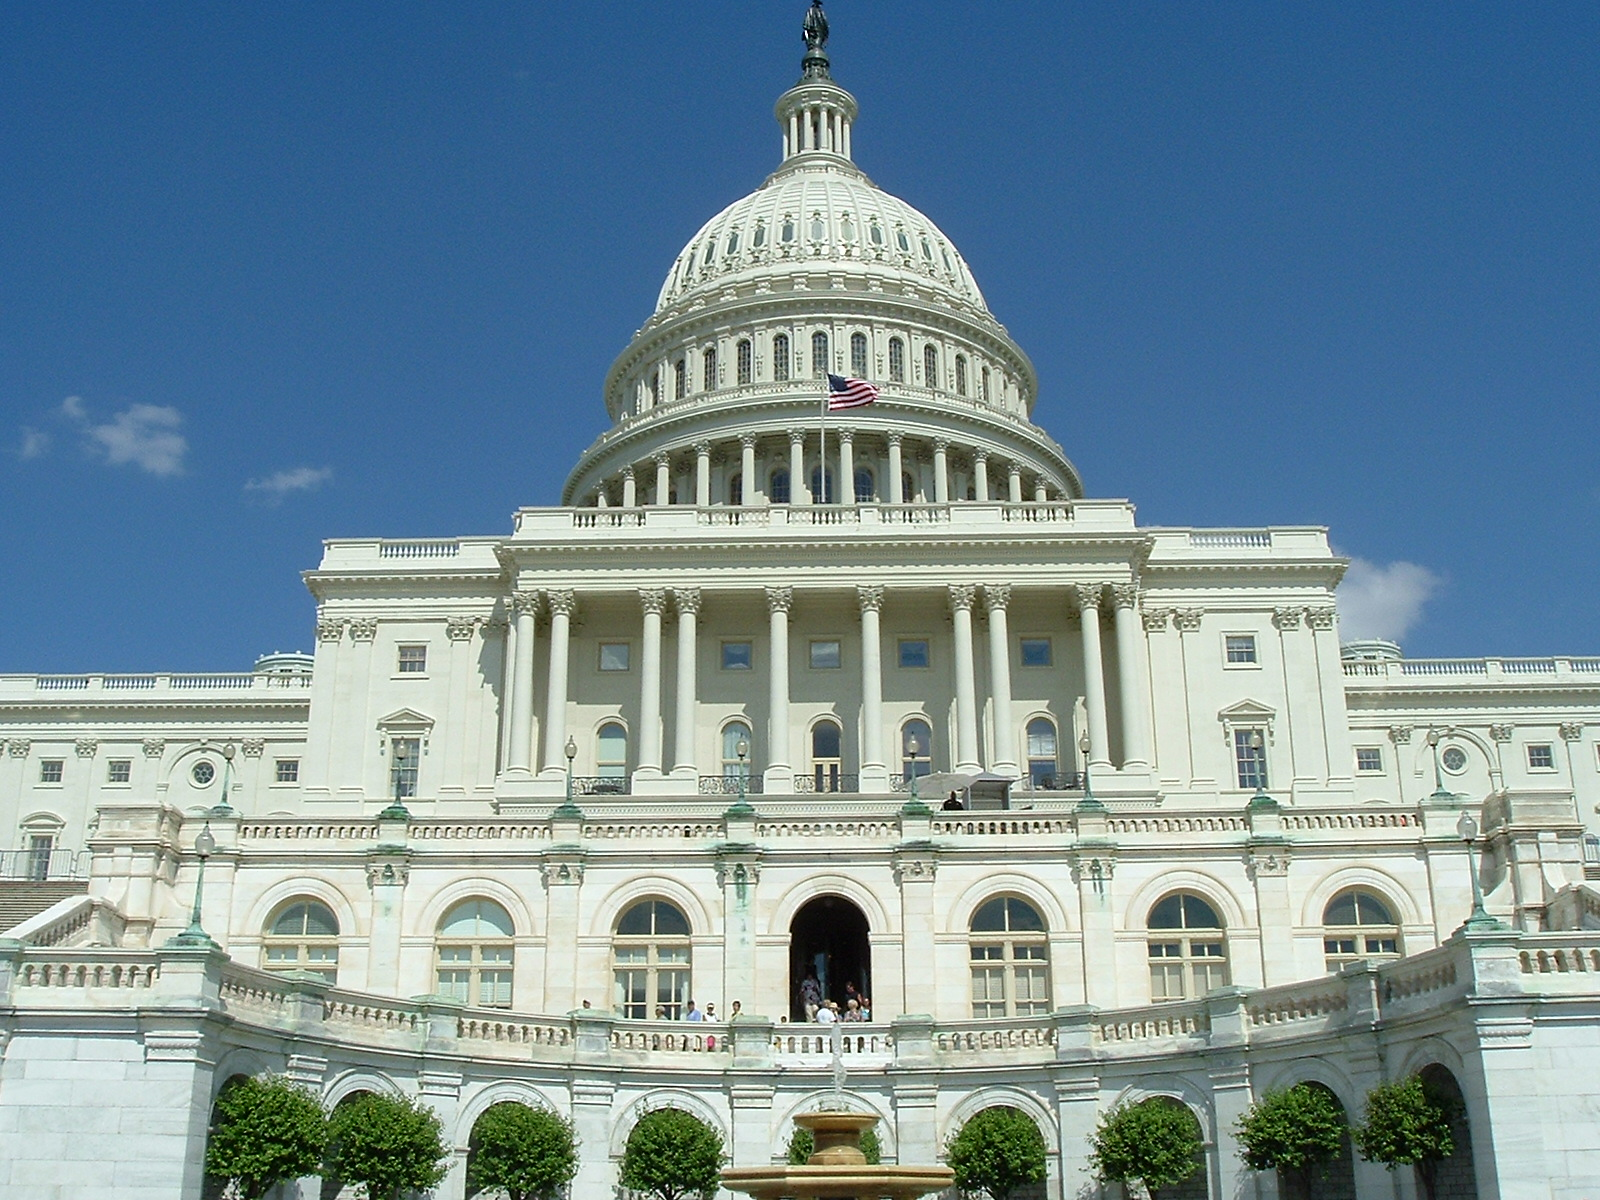 Capital in D.C.